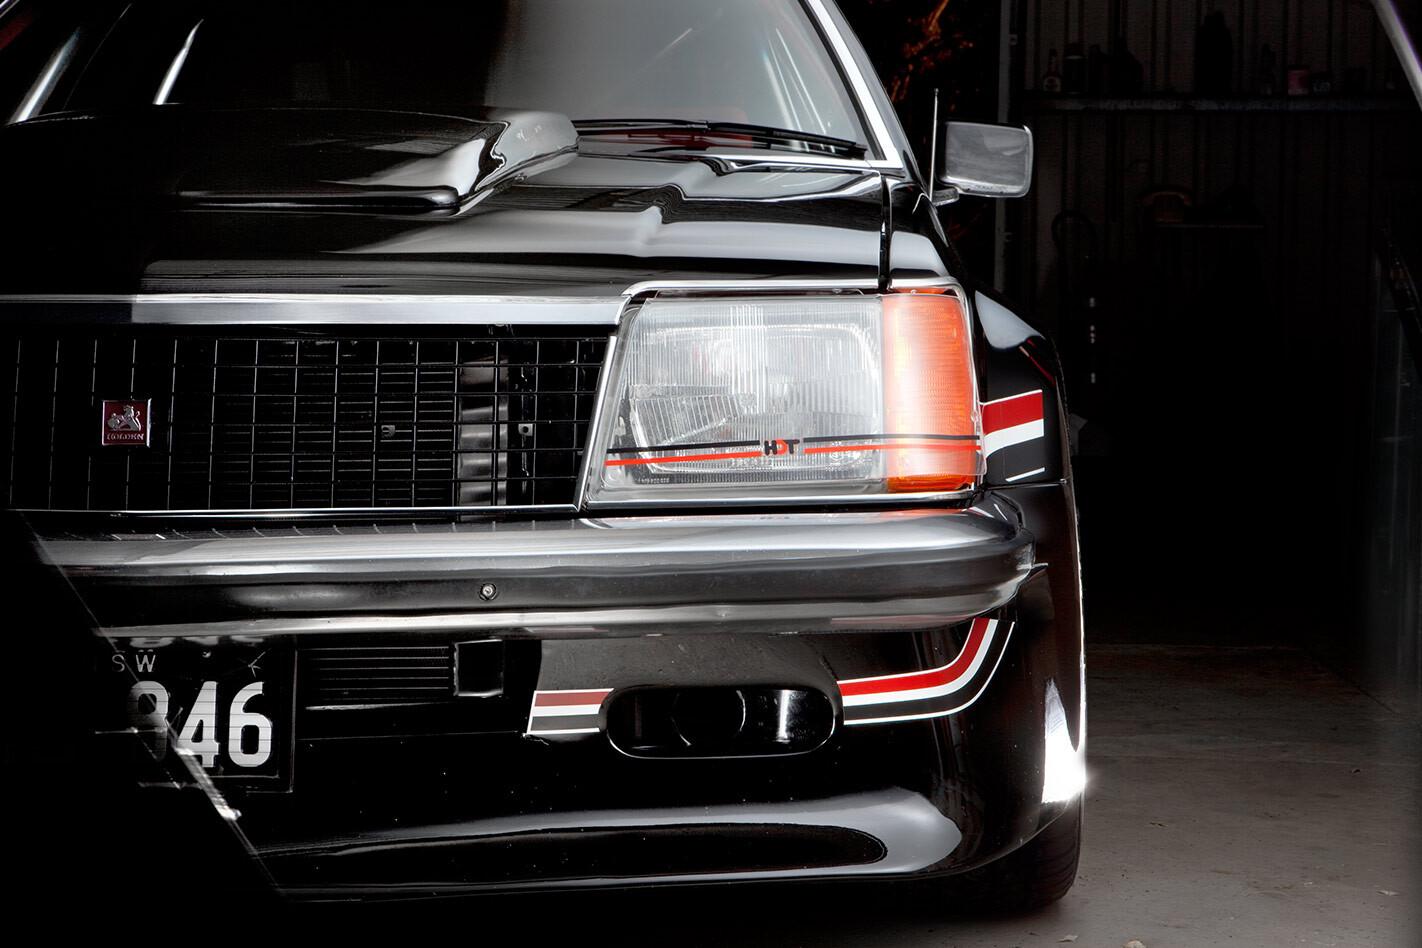 Holden Group C Commodore replica